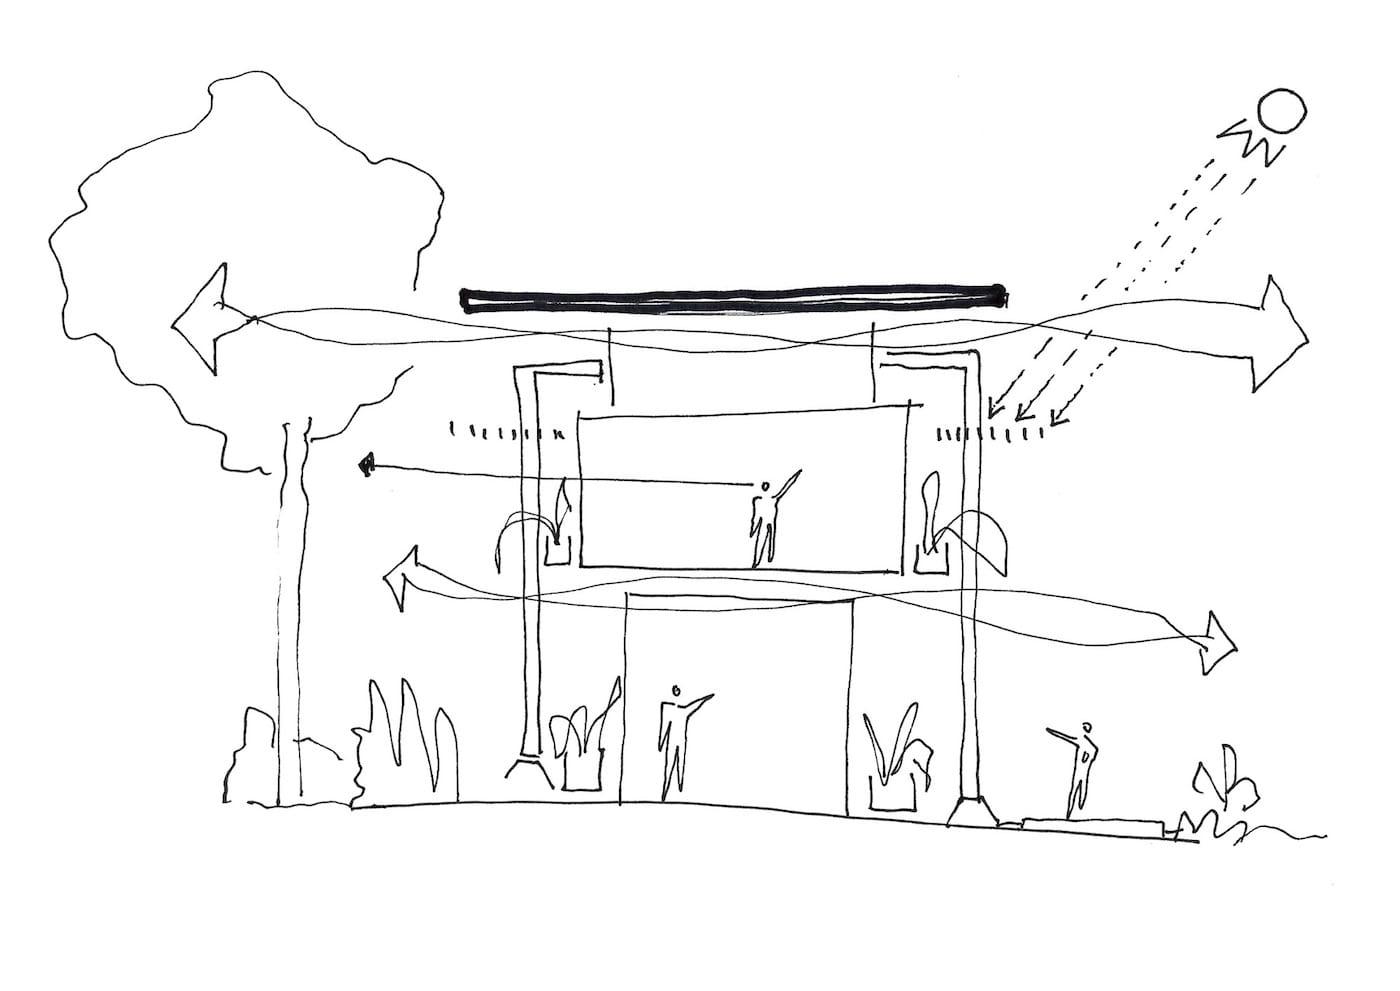 Studio-Saxe_The-Athletic-Centre_Air-flow-diagram